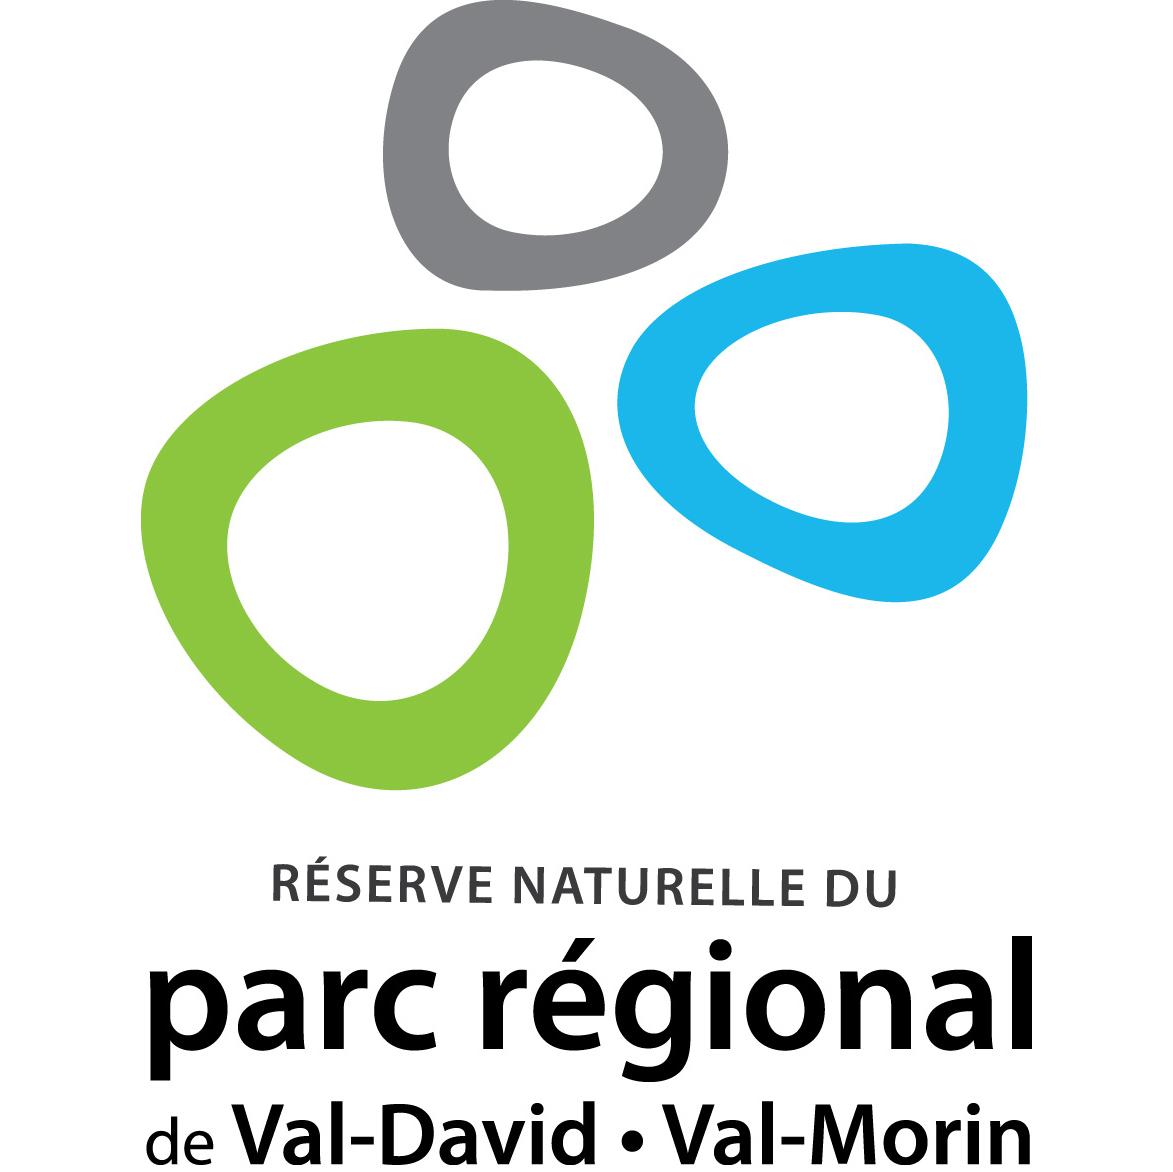 Parc régional Val-David -Val-Morin